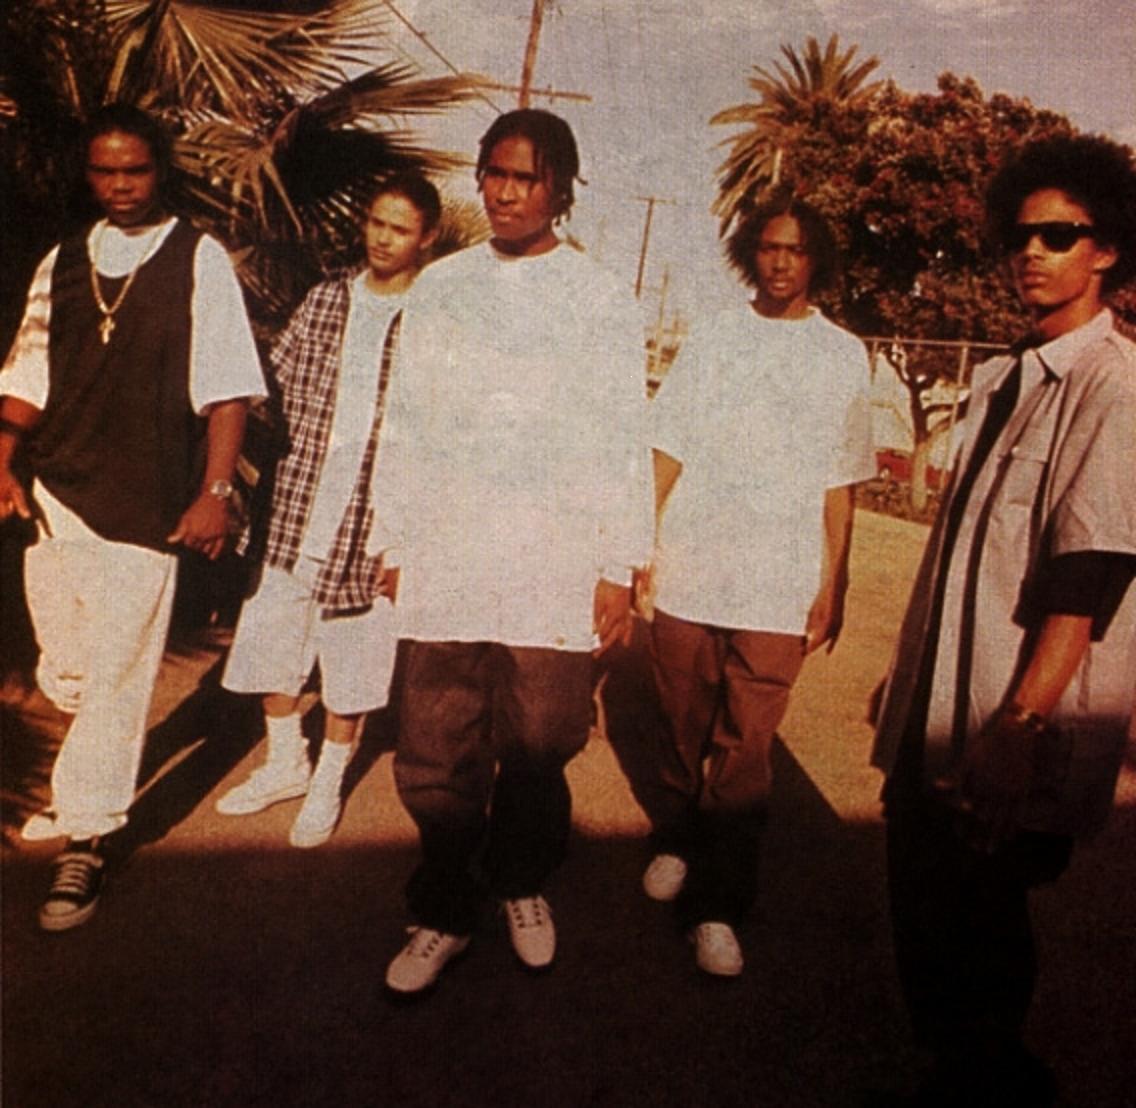 Bone Thugs N Harmony Wallpaper Download Wallpaper 1136x1108